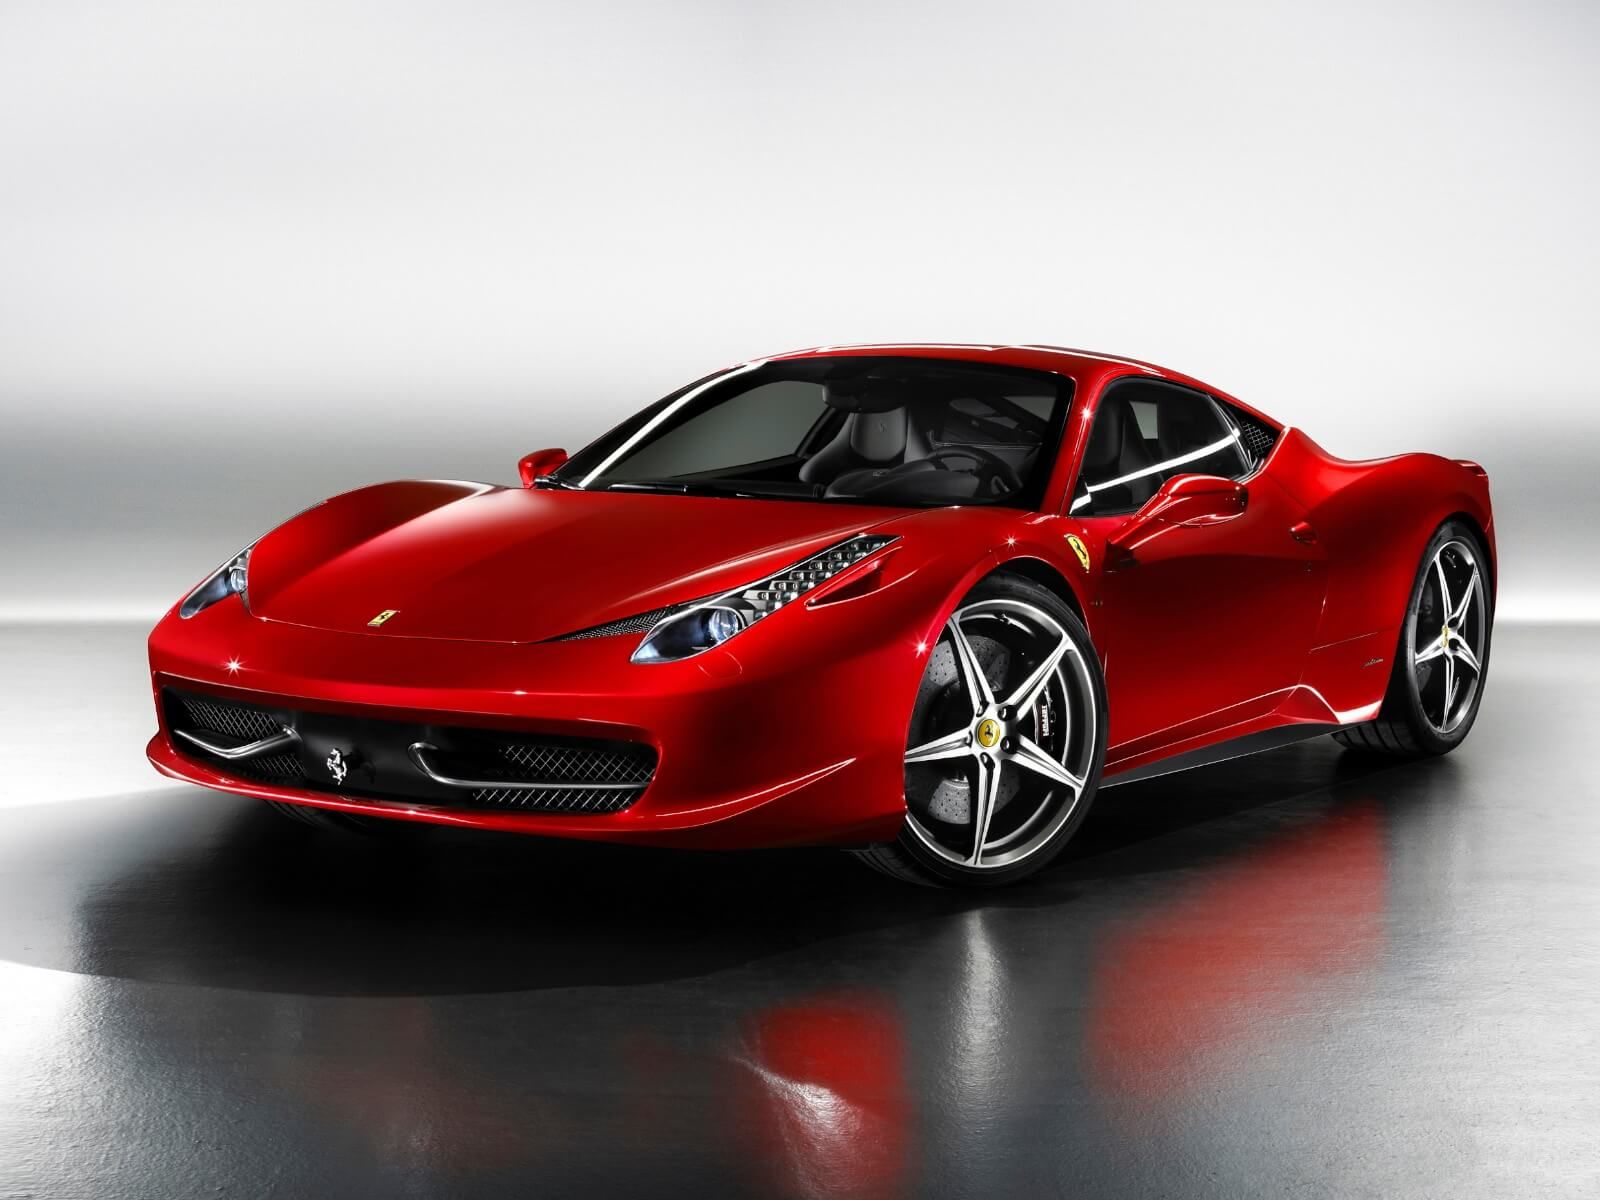 2020 Ferrari 458 New Review